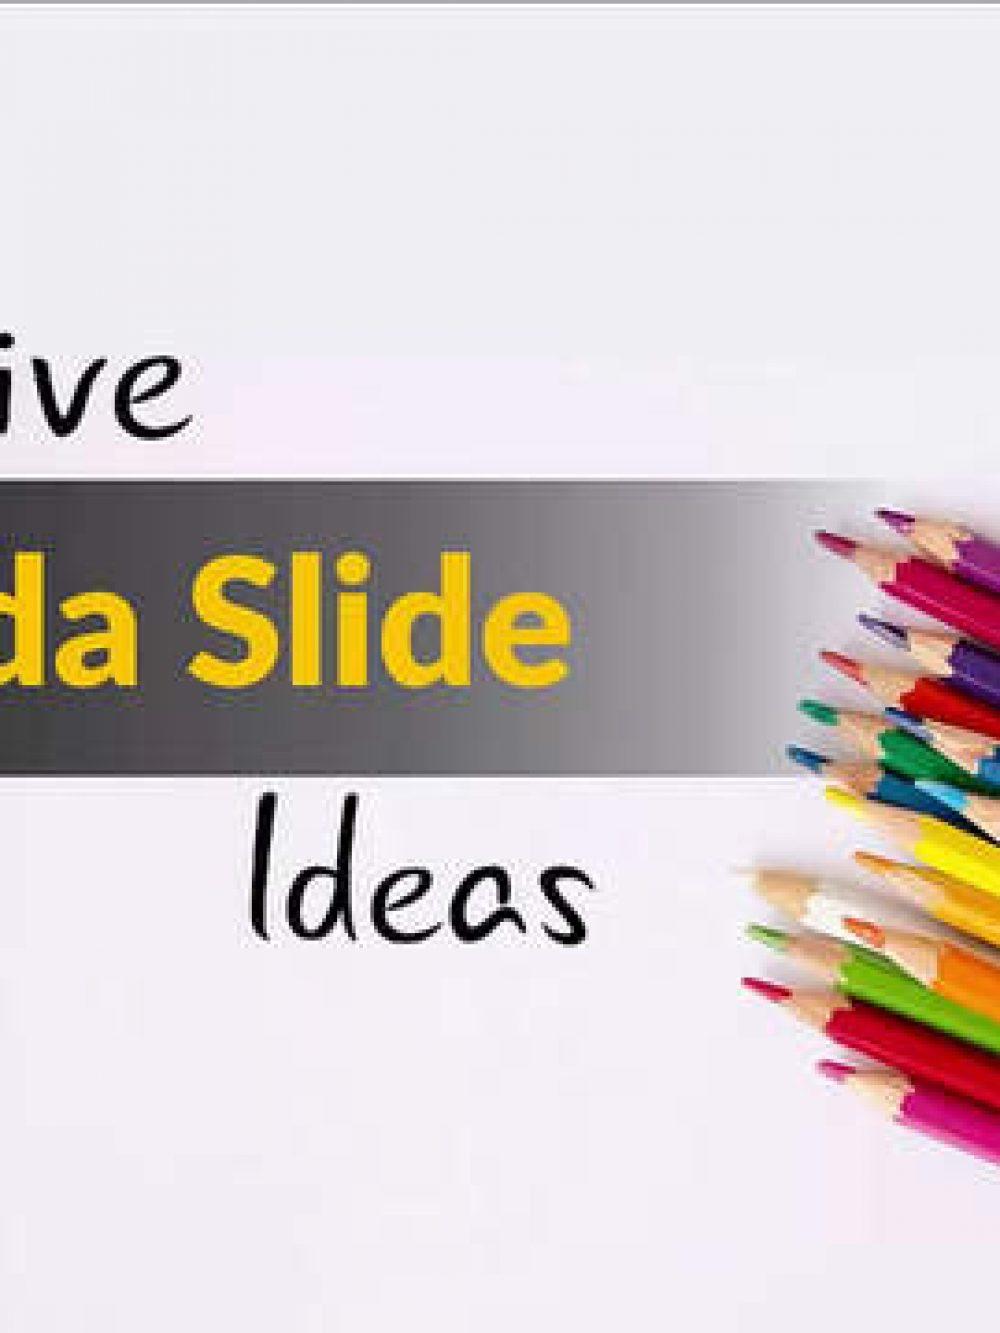 agenda-slide-ideas-ecourse-featured-image